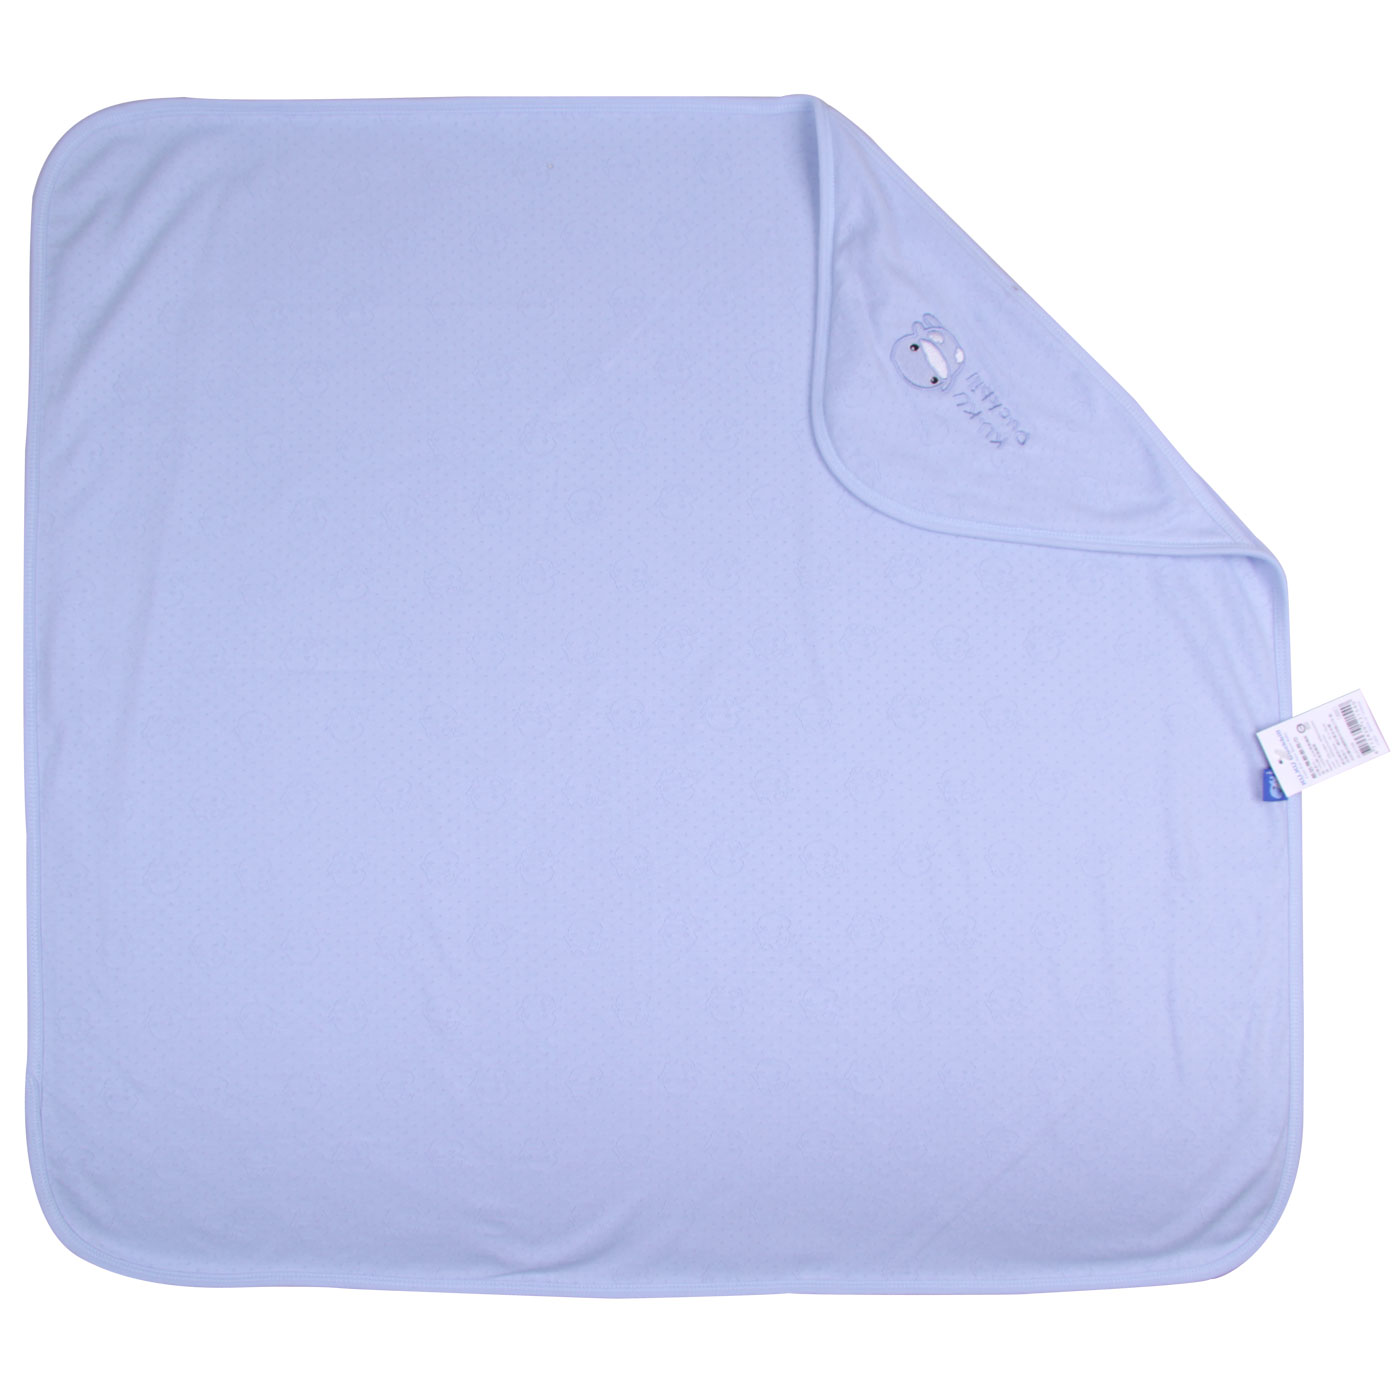 Kuku Duckbill Spring Receiving Blanket Solid Blue